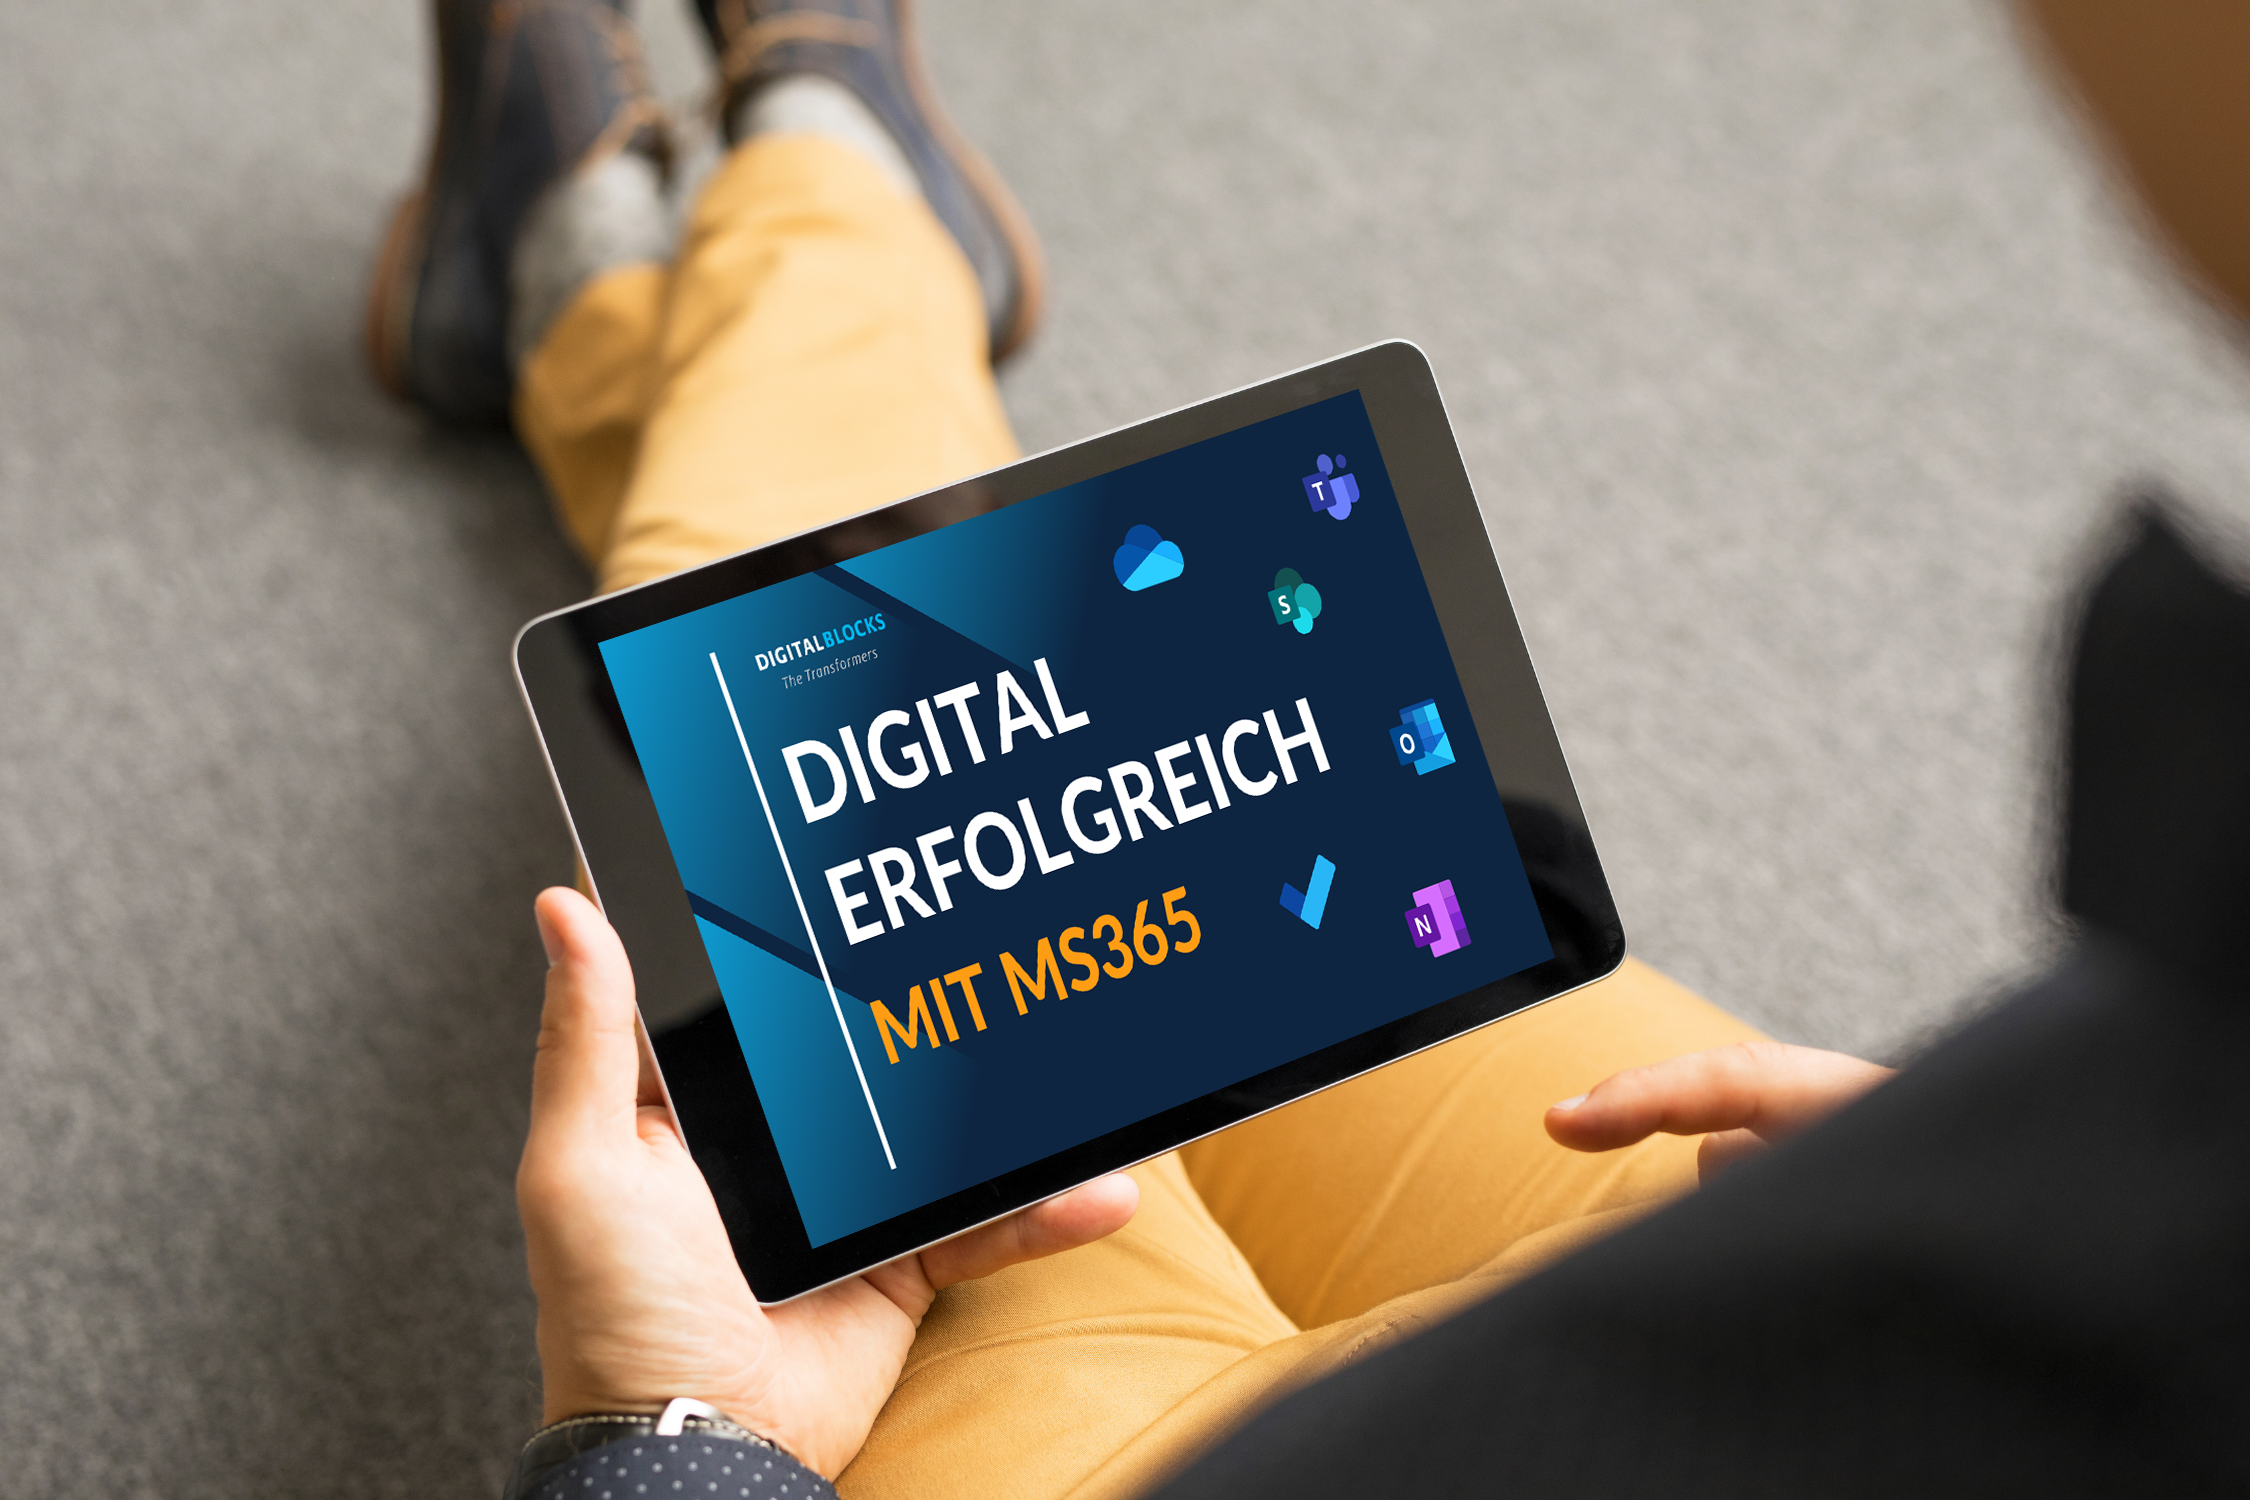 digital erfolgreich